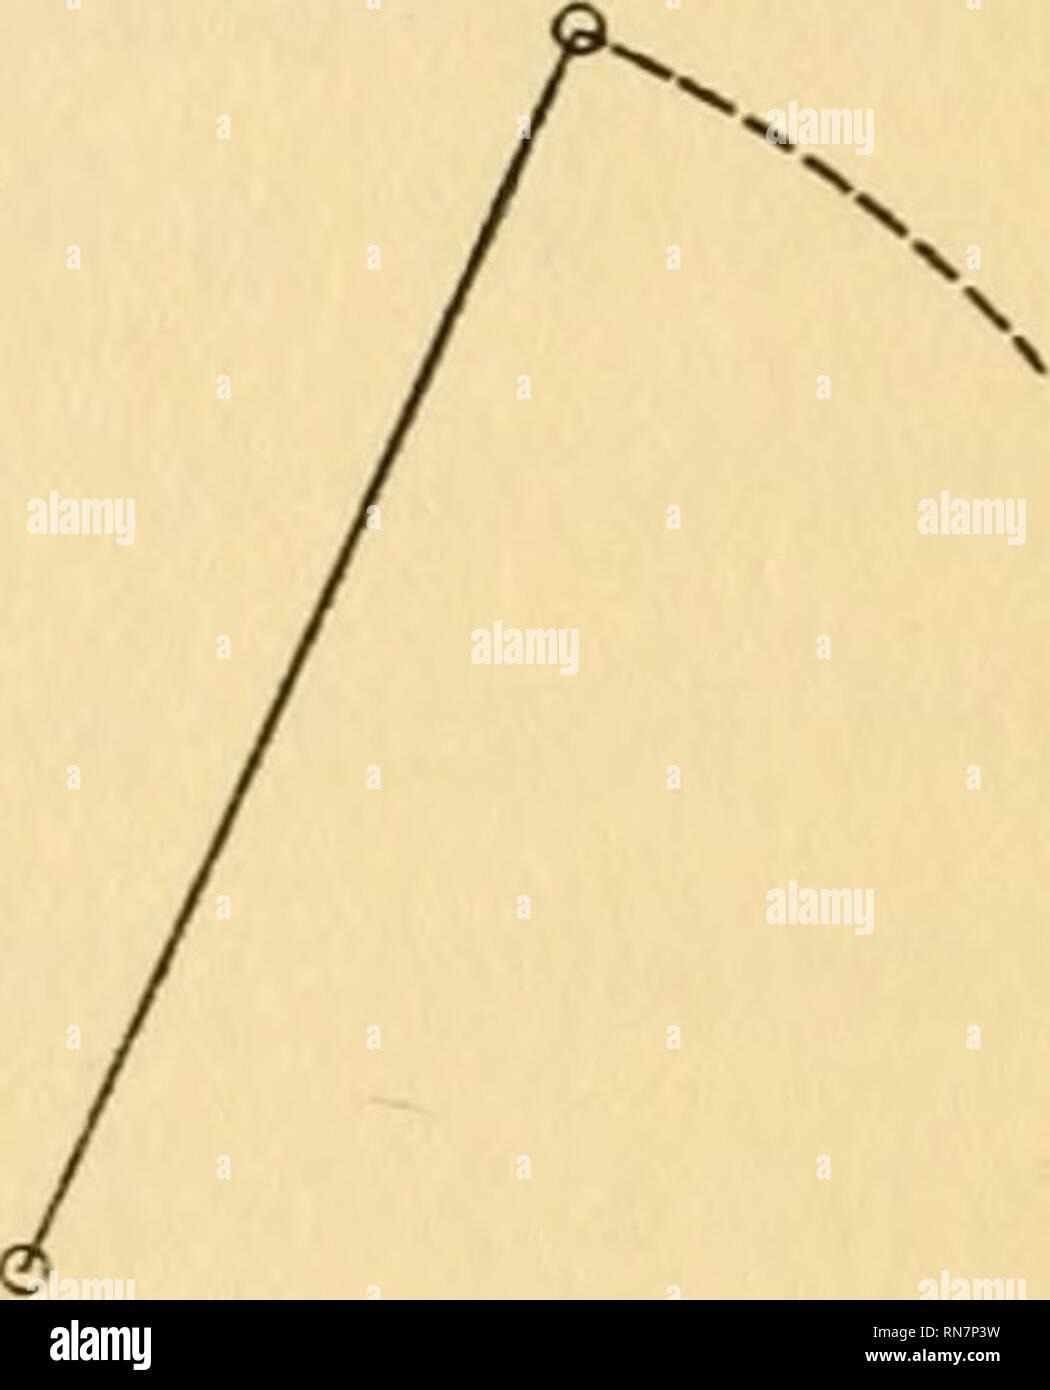 Euclid Geometry Stock Photos & Euclid Geometry Stock Images - Alamy